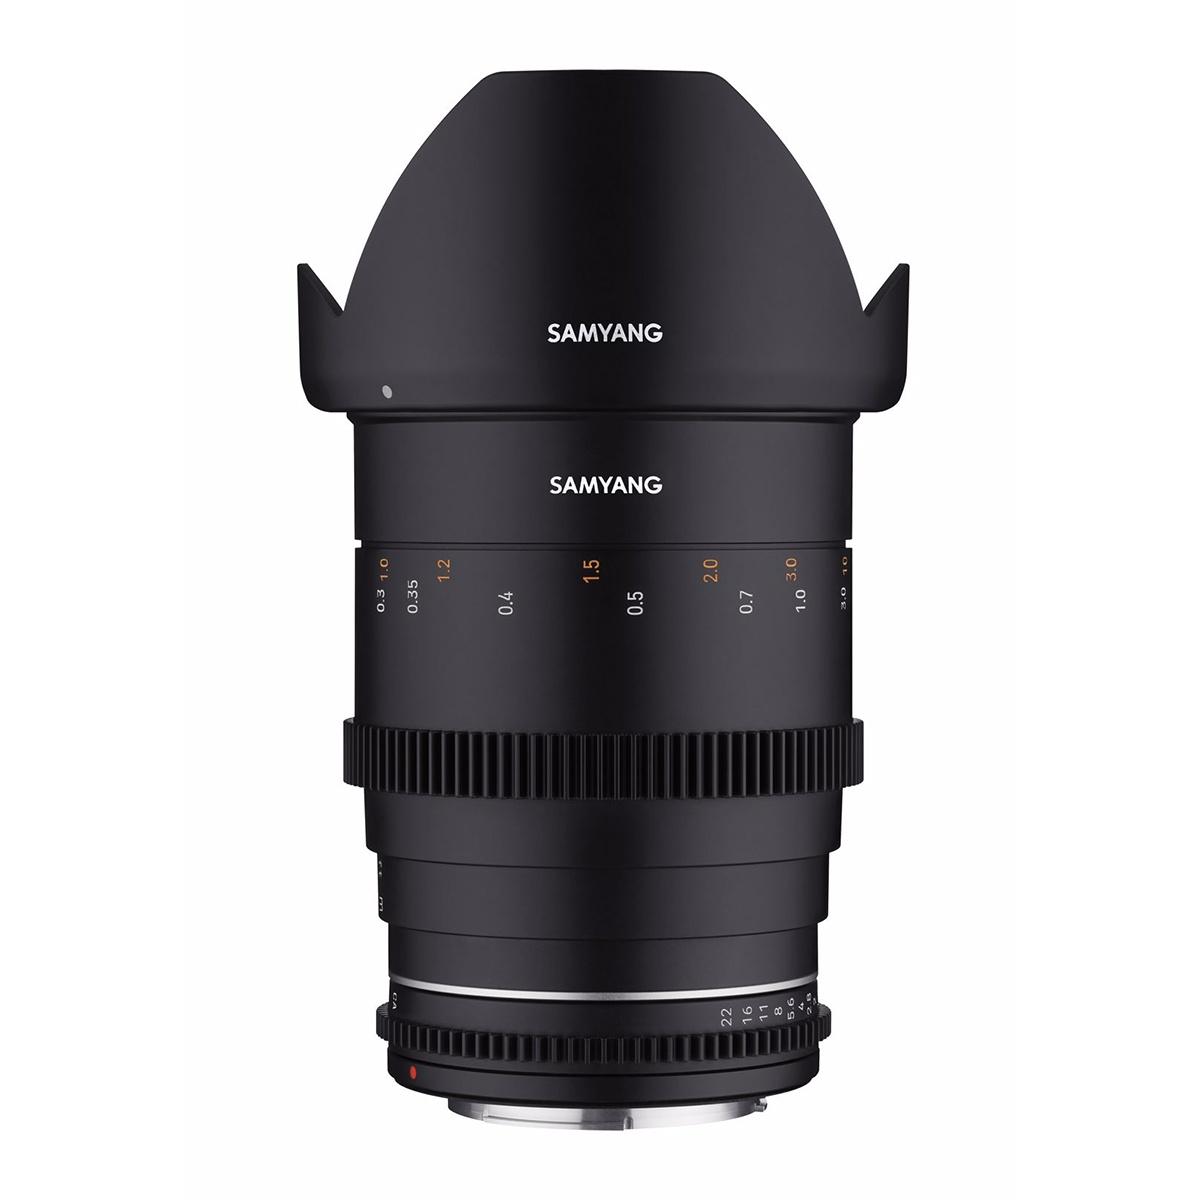 SAMYANG 35mm T1.5 VDSLR MK2 Canon EF